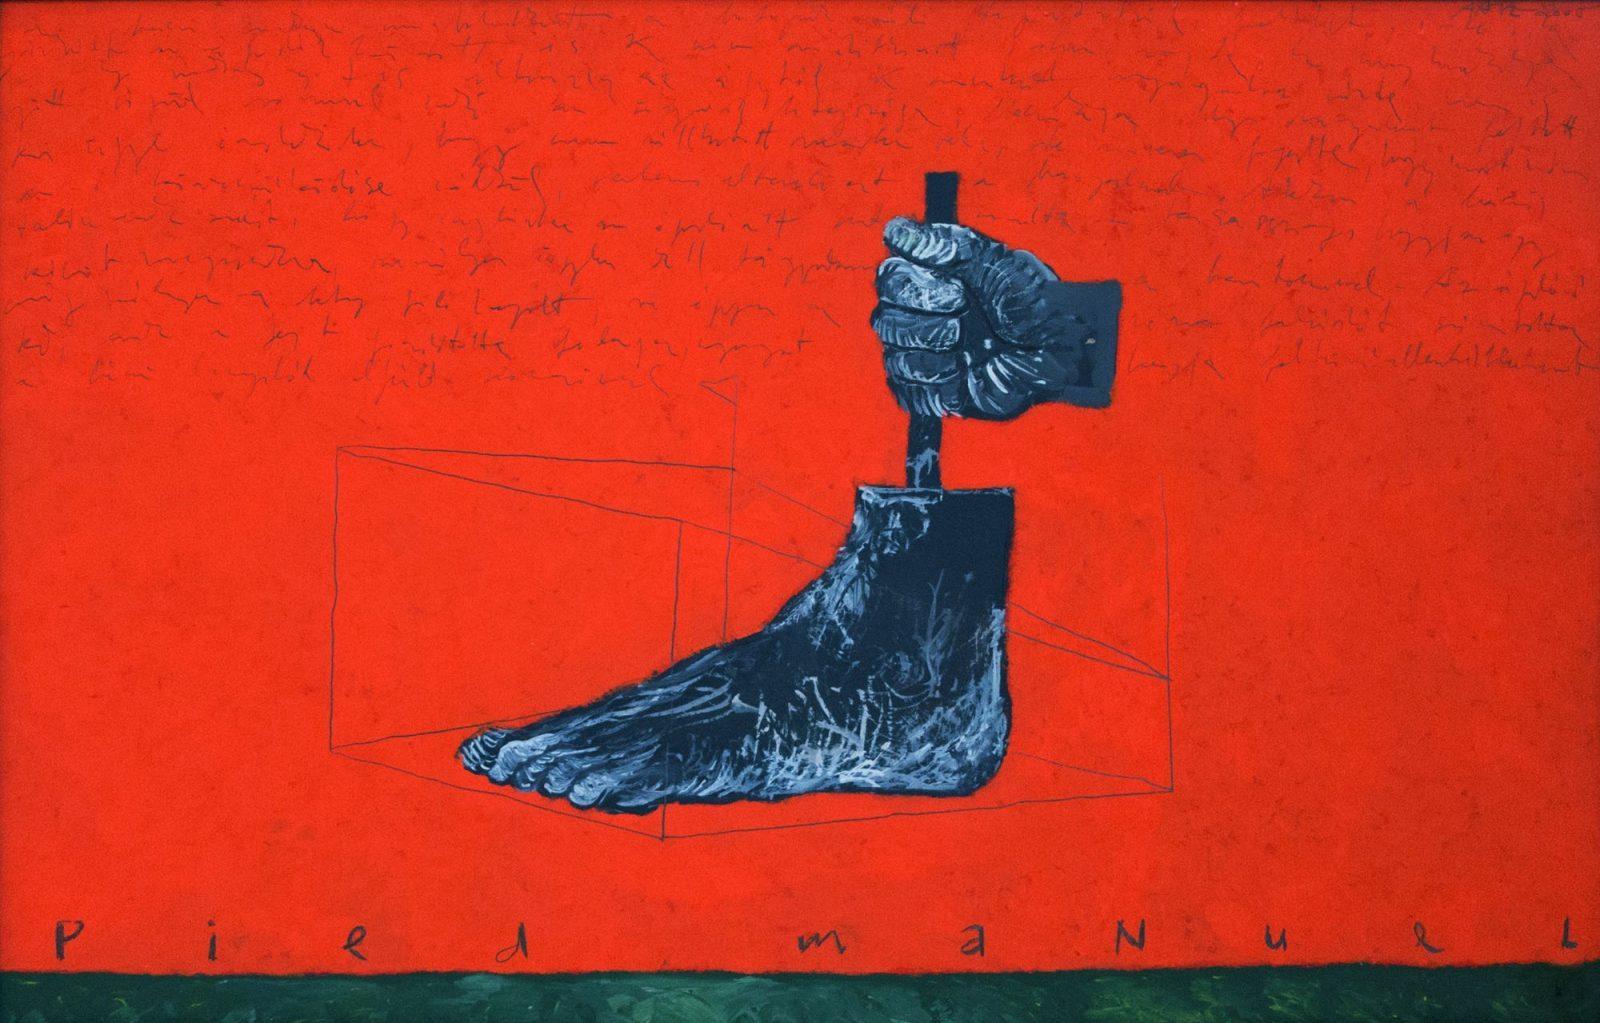 franyo aatoth: Manual Leg